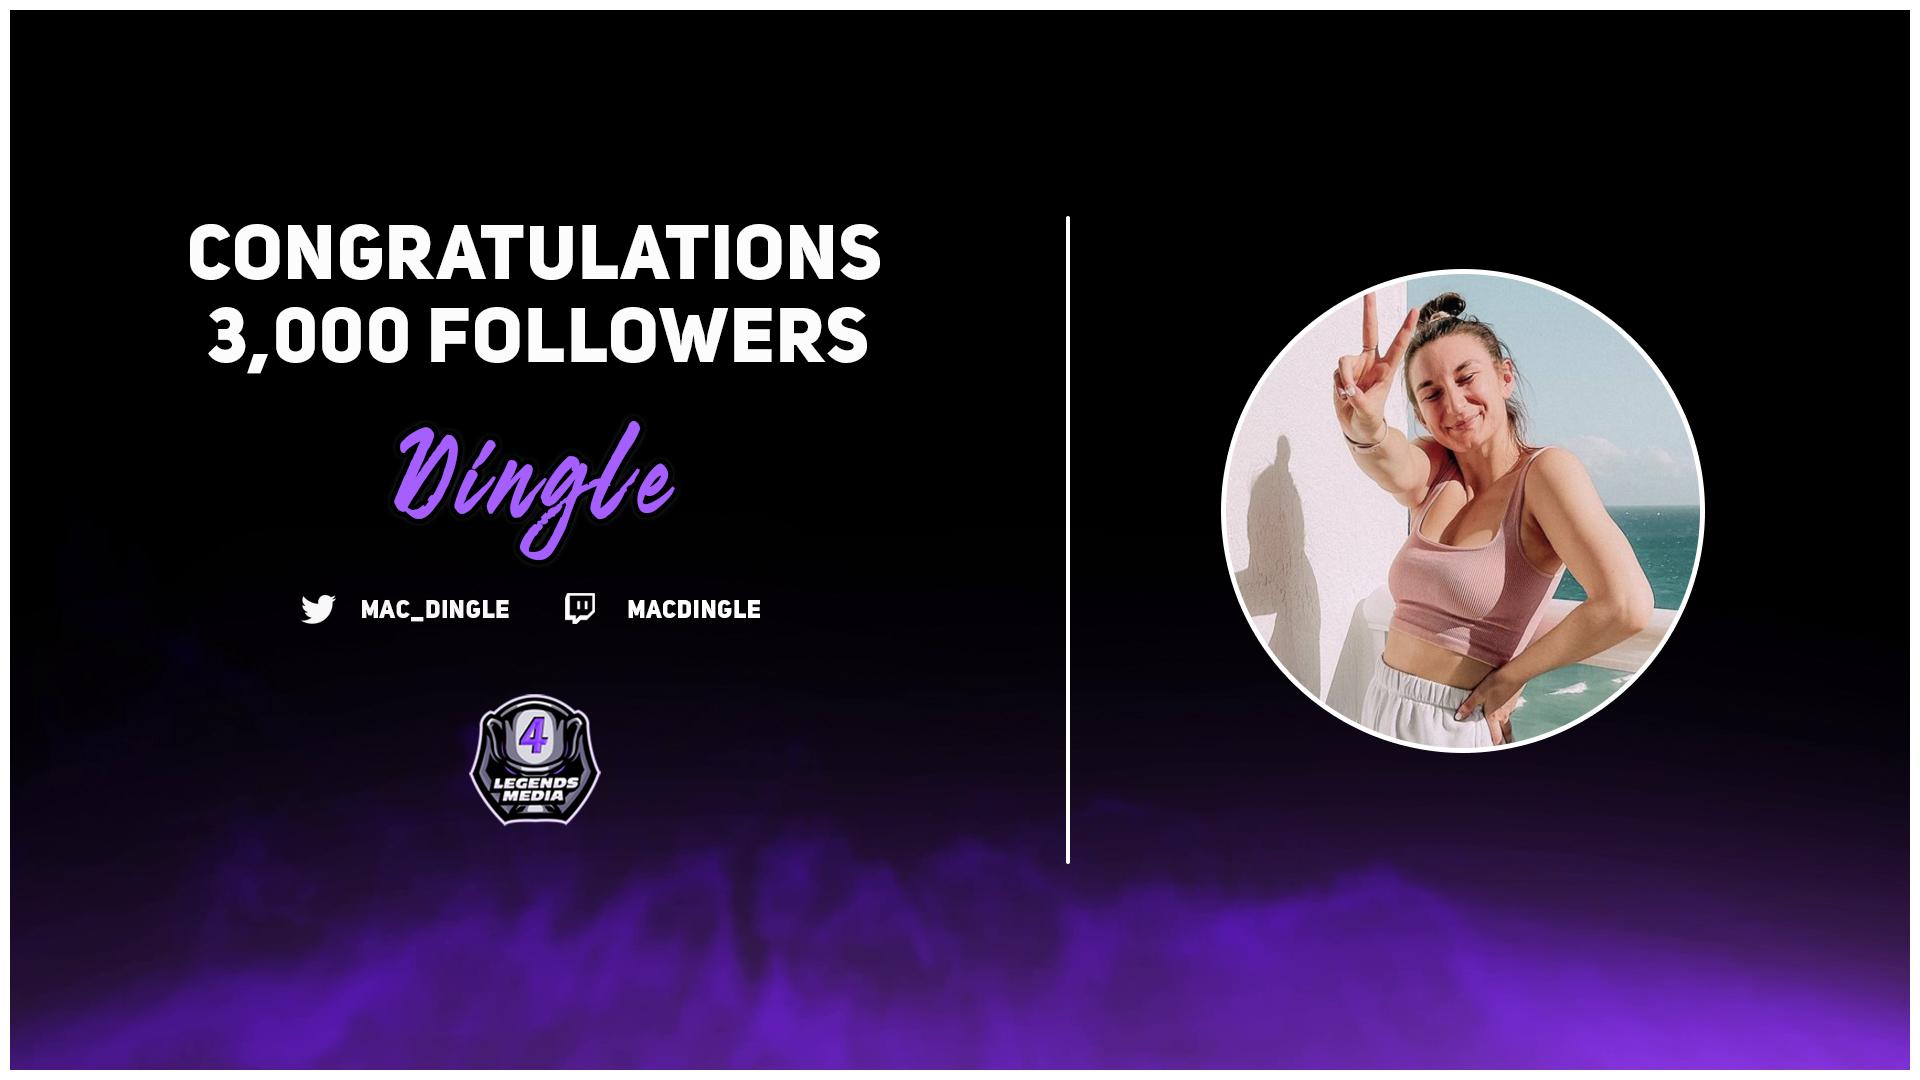 Congrats on 3,000 Twitch Followers, Dingle!